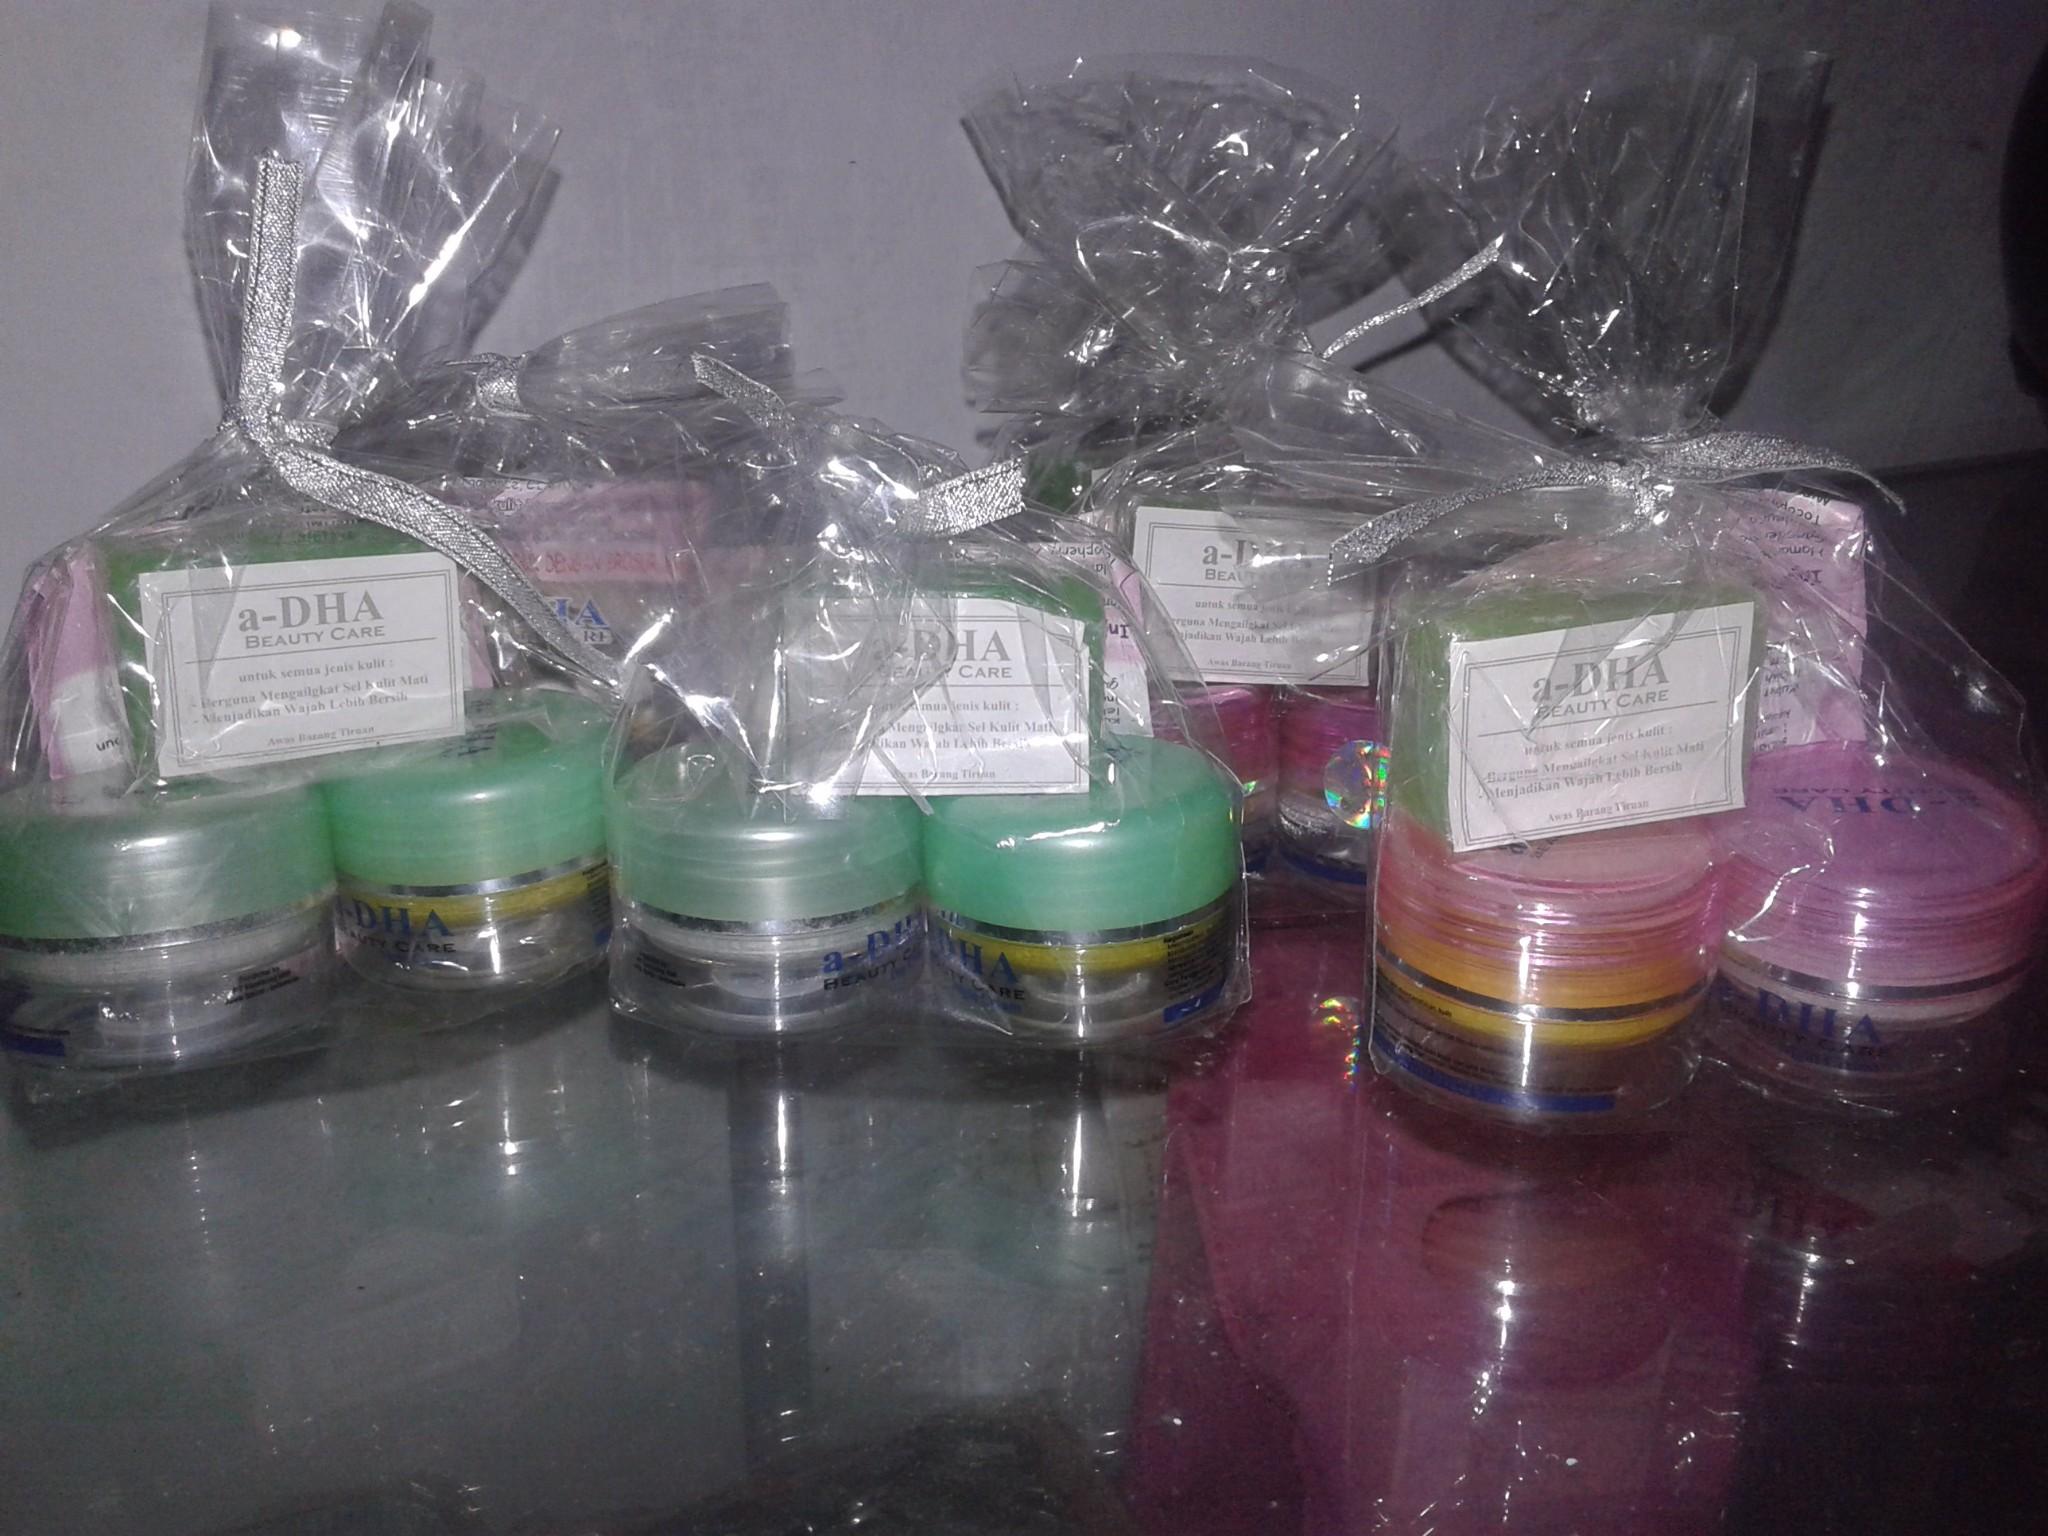 Cream A Dha Beauty Care White Series Dijamin Asli Detikforum Hologram Click Here To See Large Version